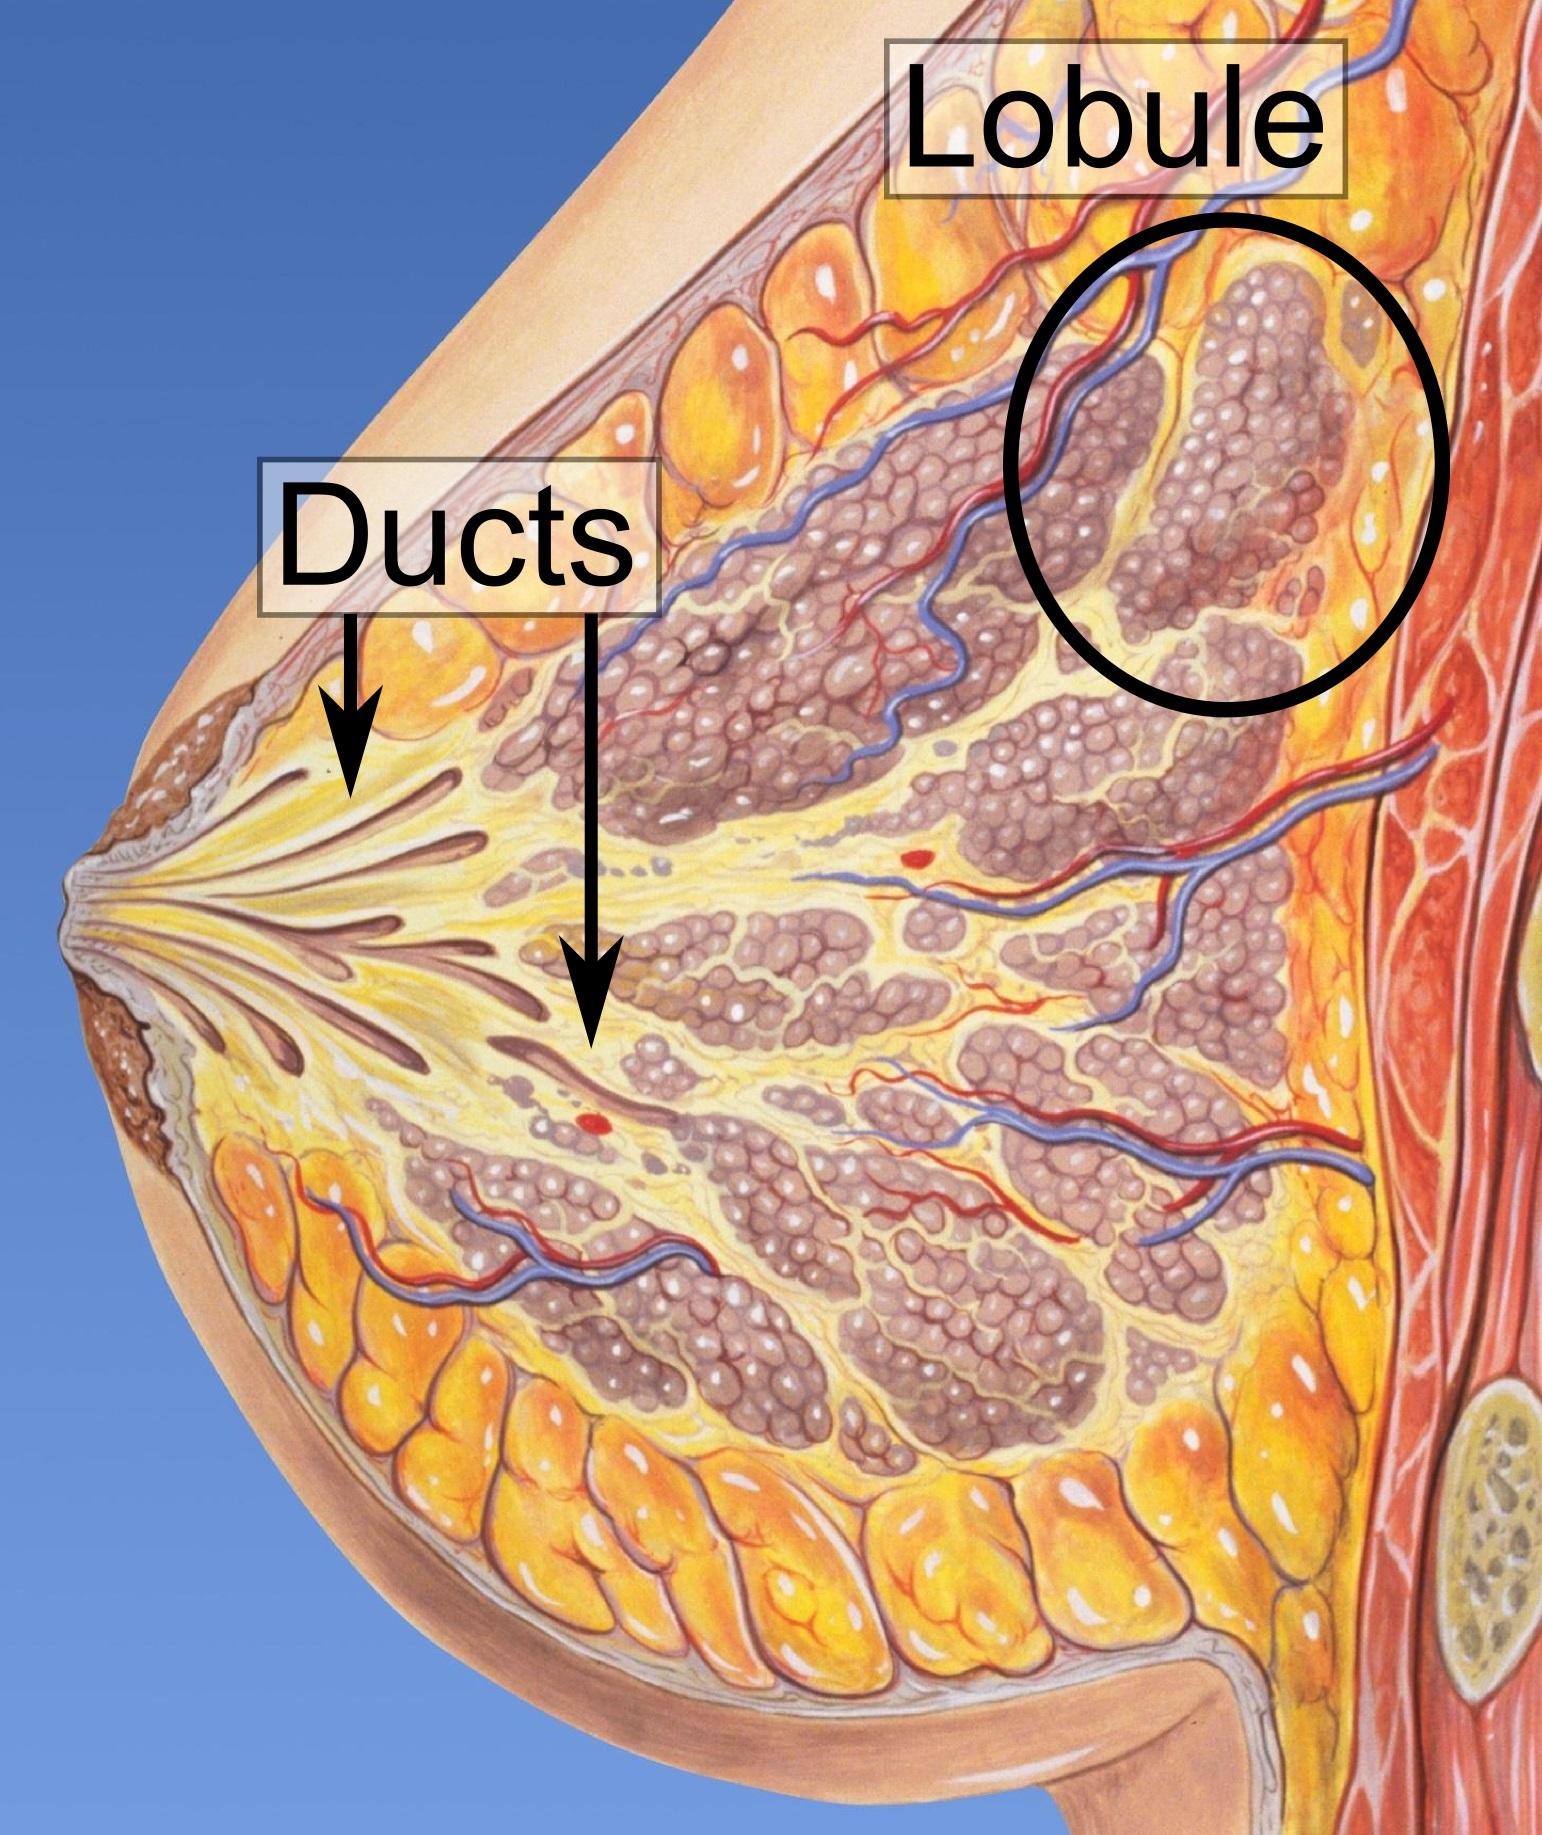 papillomatosis breast icd 10 que caracteristicas tiene un virus del papiloma humano